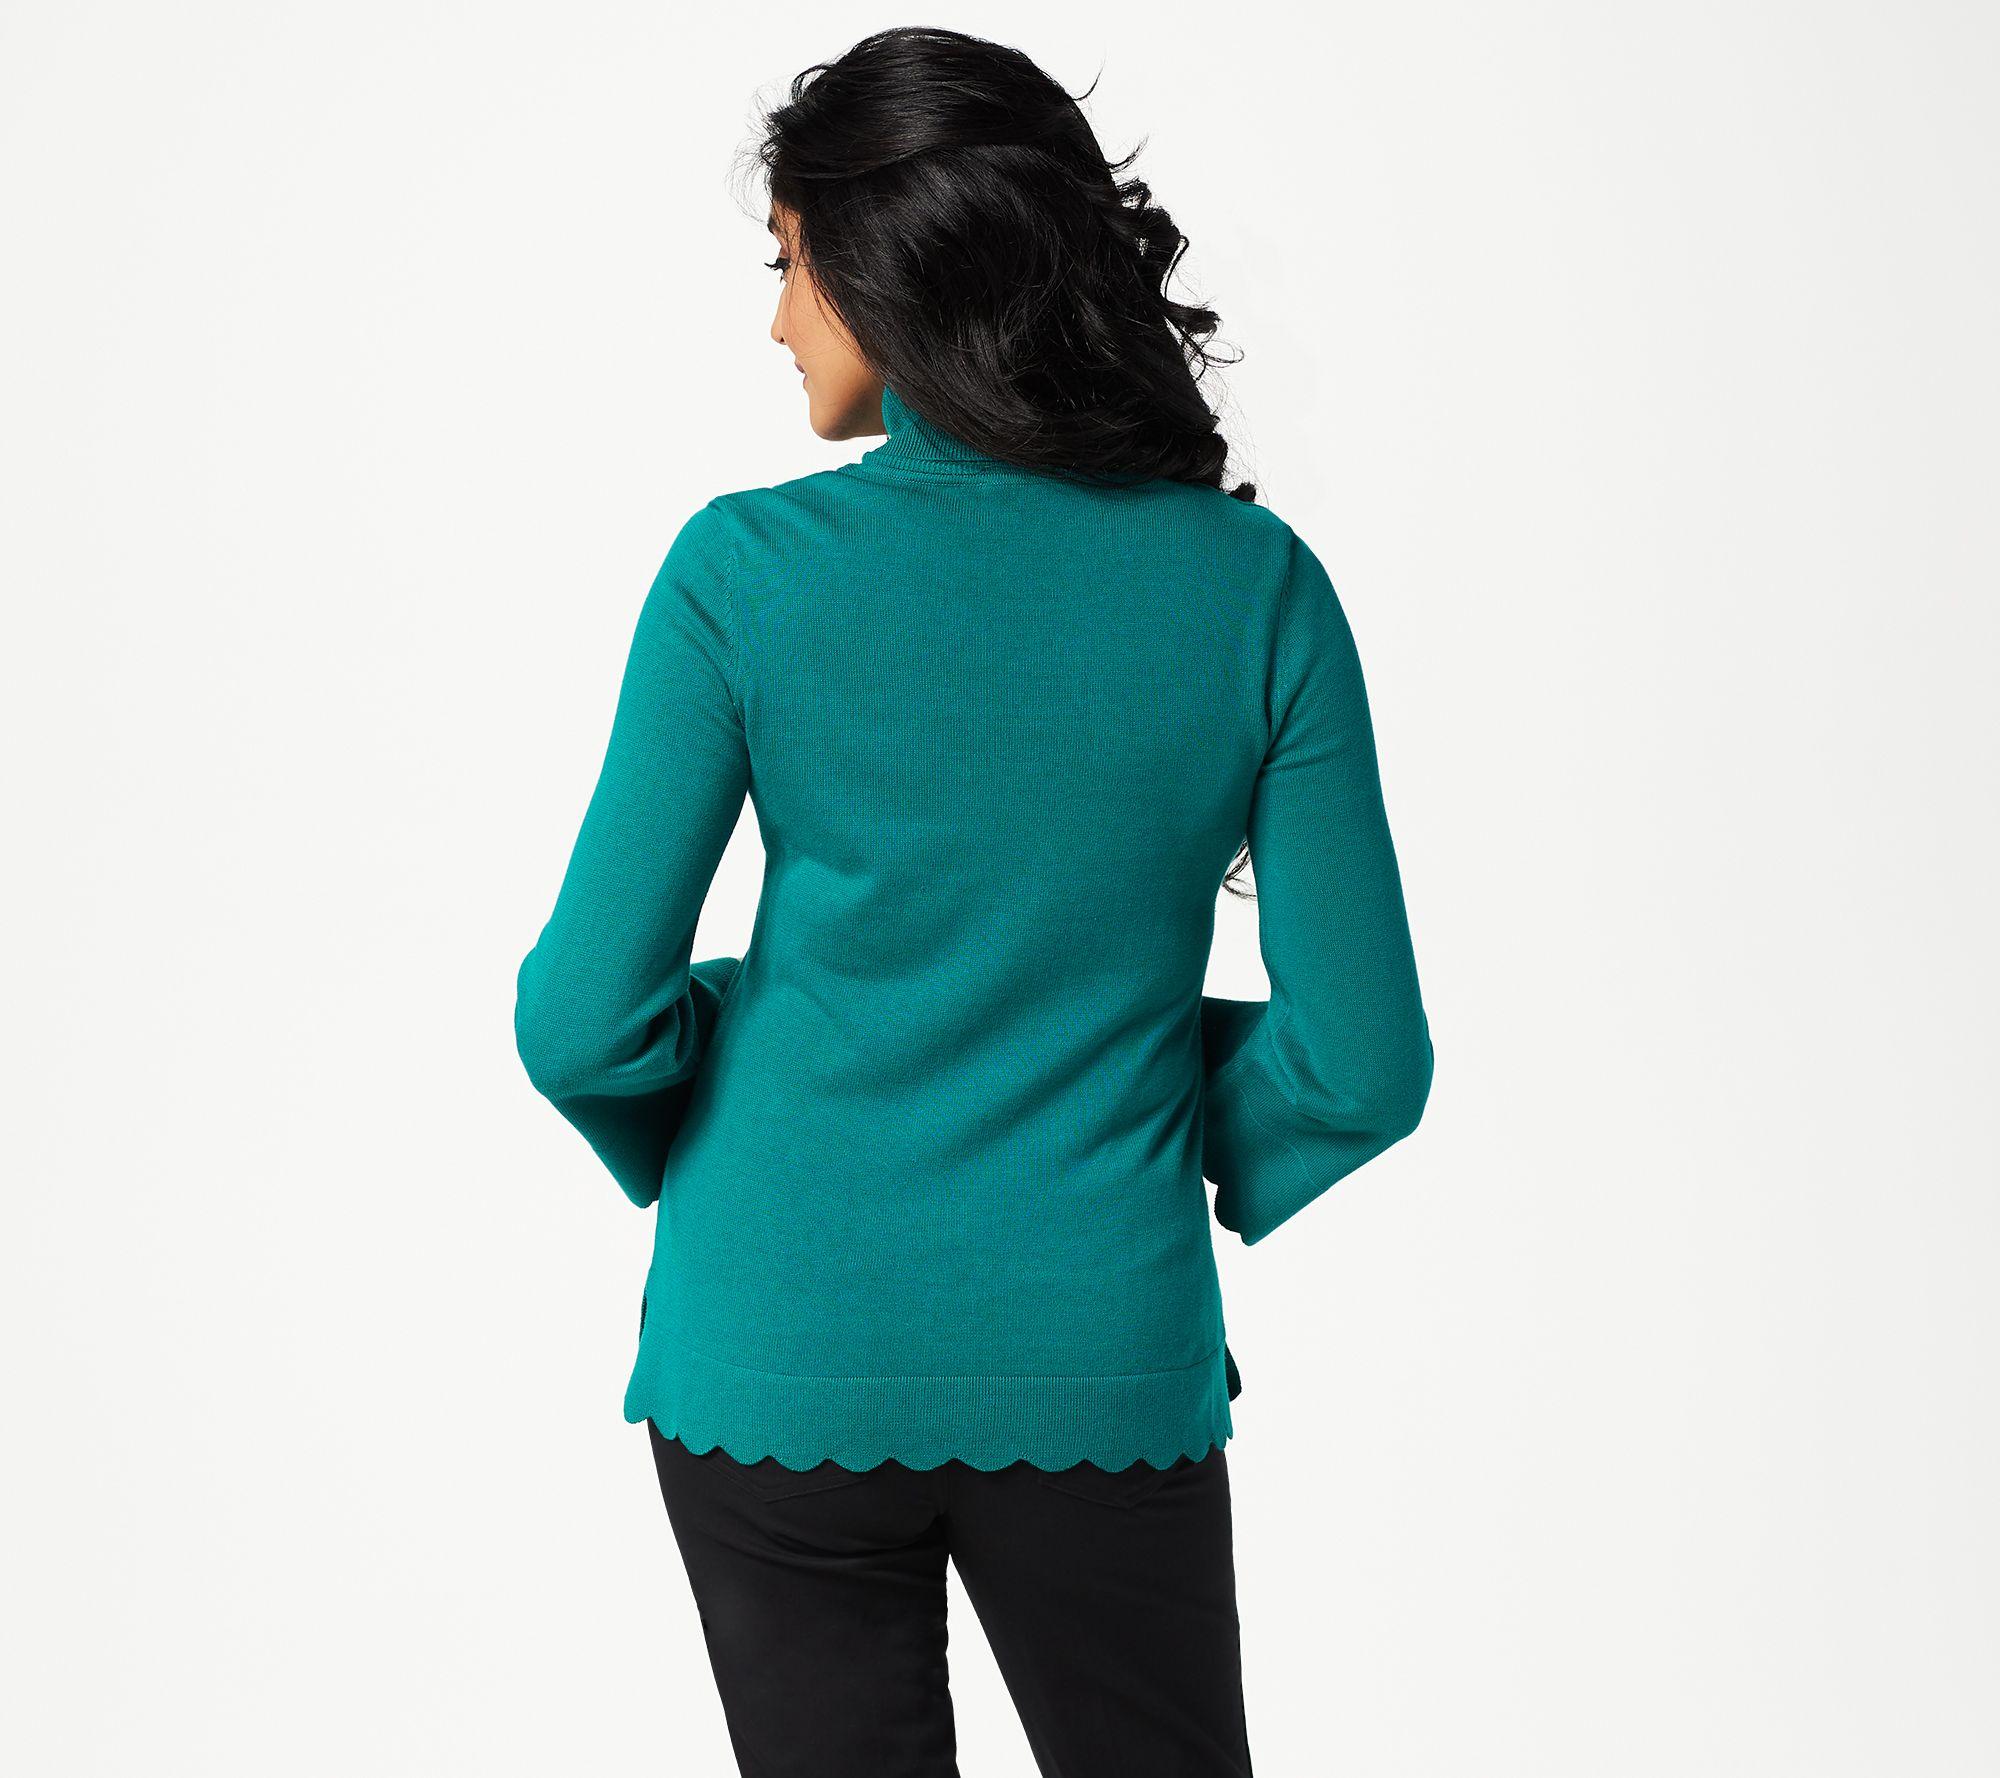 64b60f71bea Isaac Mizrahi Live! Scallop Hem Turtleneck Sweater - Page 1 — QVC.com